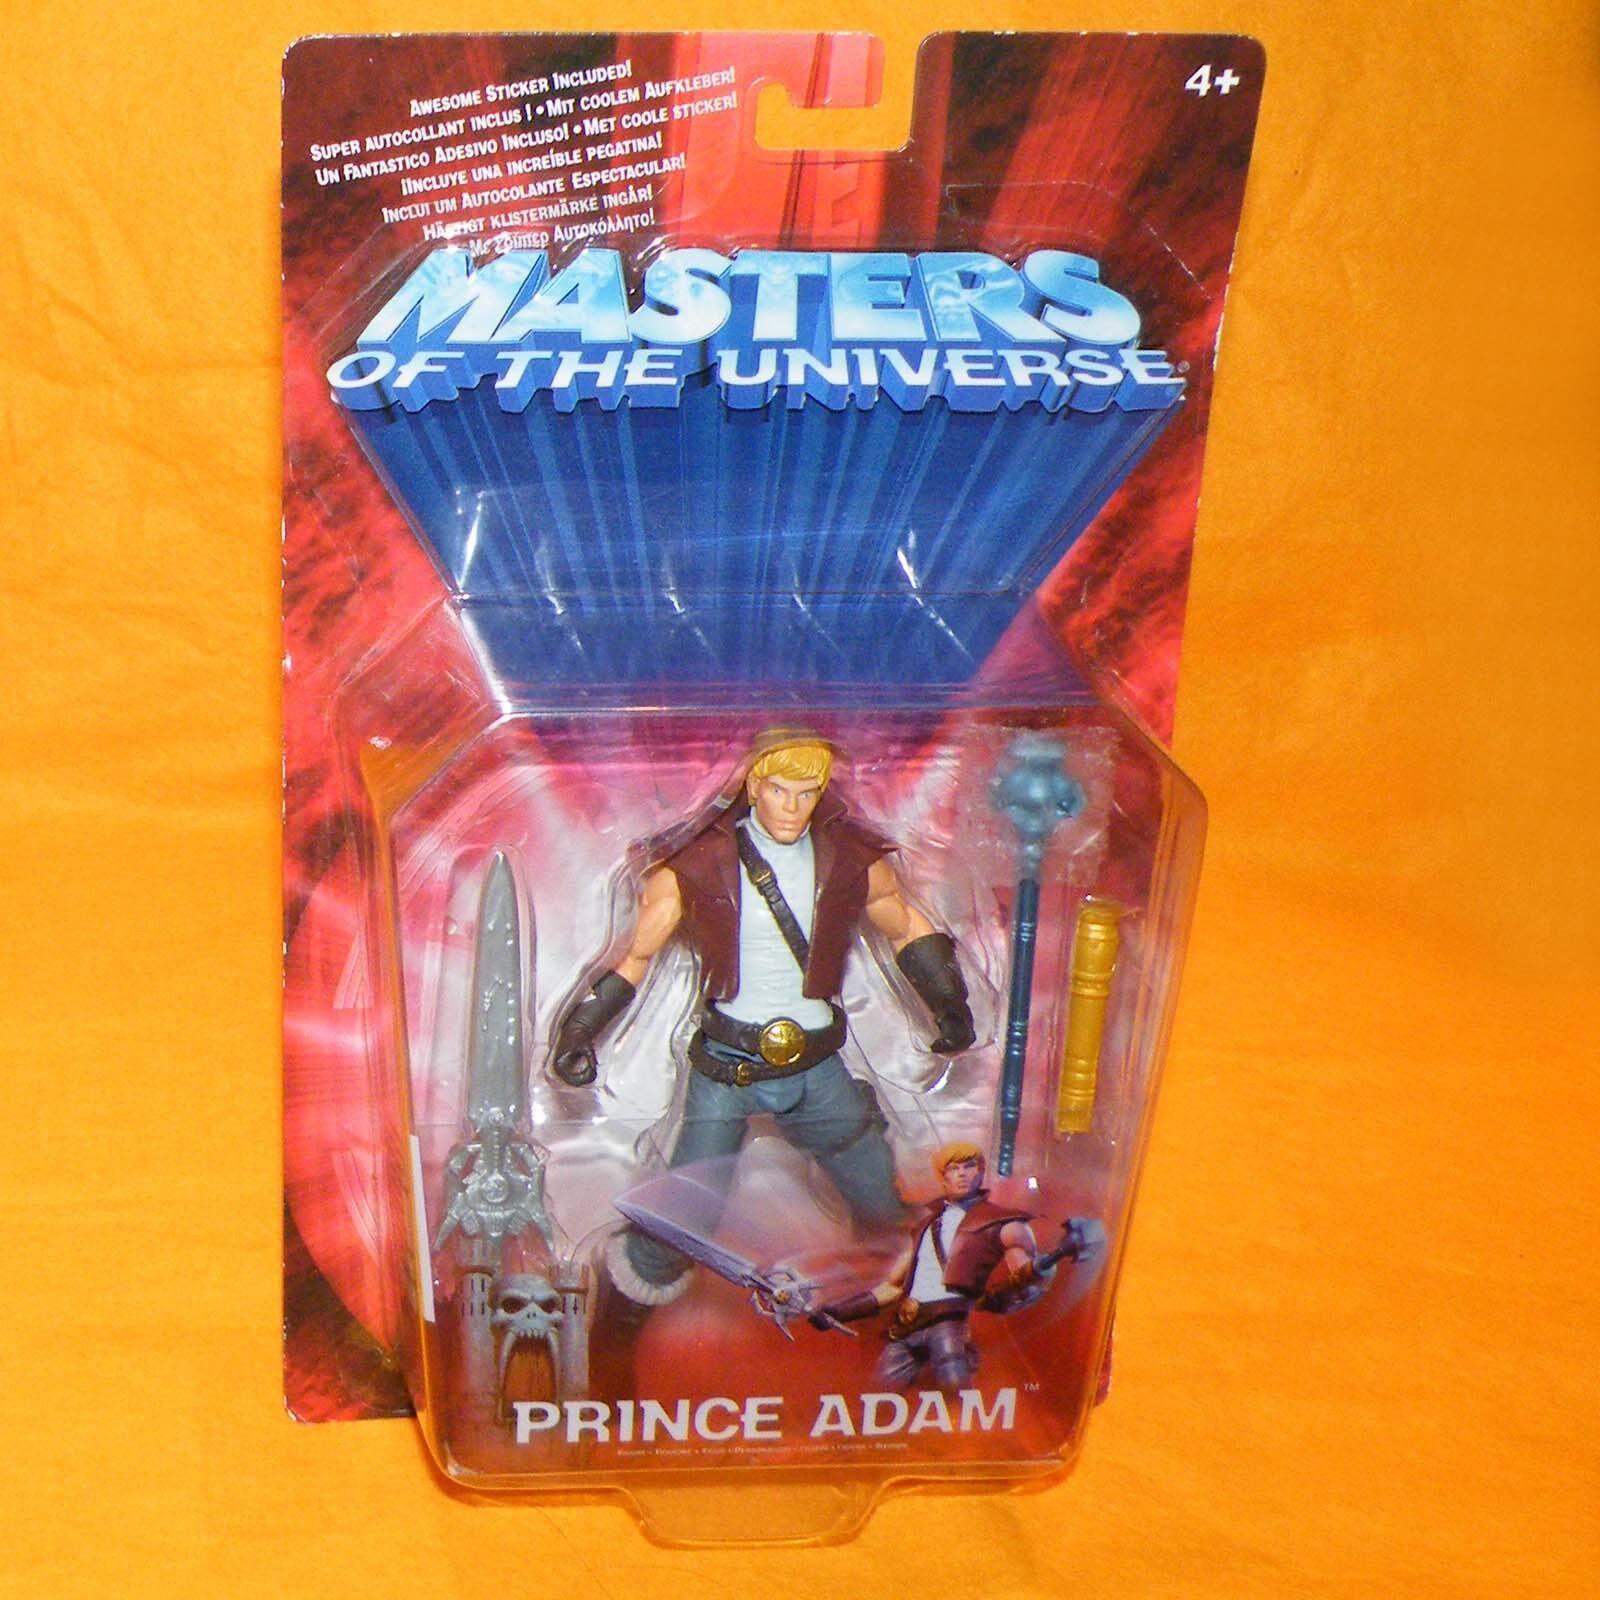 2002 MATTEL MODERN SERIES MOTU HE-MAN MASTERS OF THE UNIVERSE PRINCE ADAM MOC